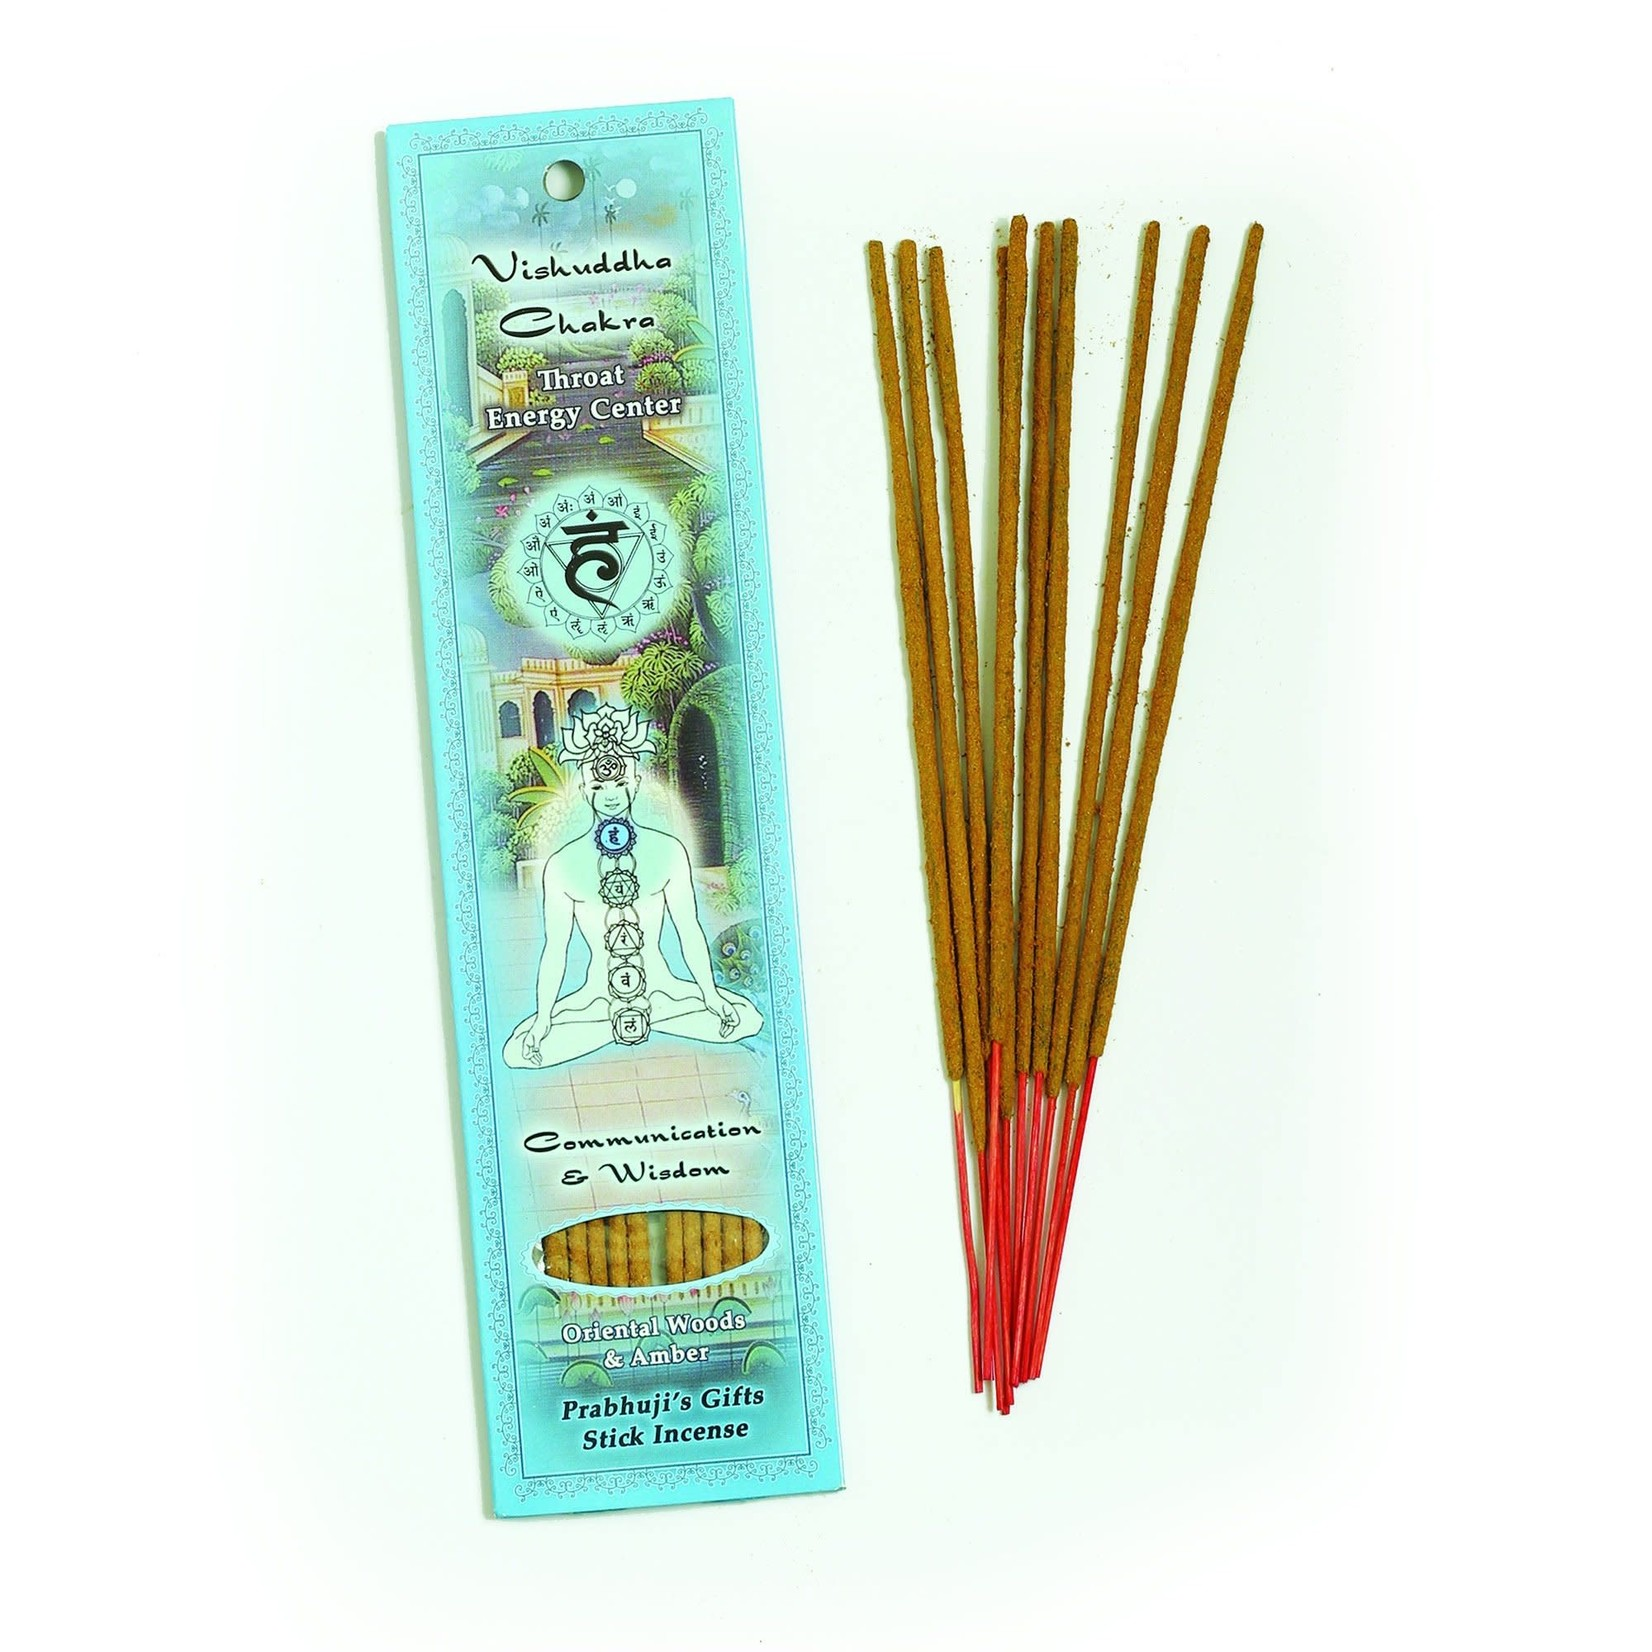 Prabhujis Gifts Throat Chakra Vishuddha - Communication and Wisdom Incense Stick